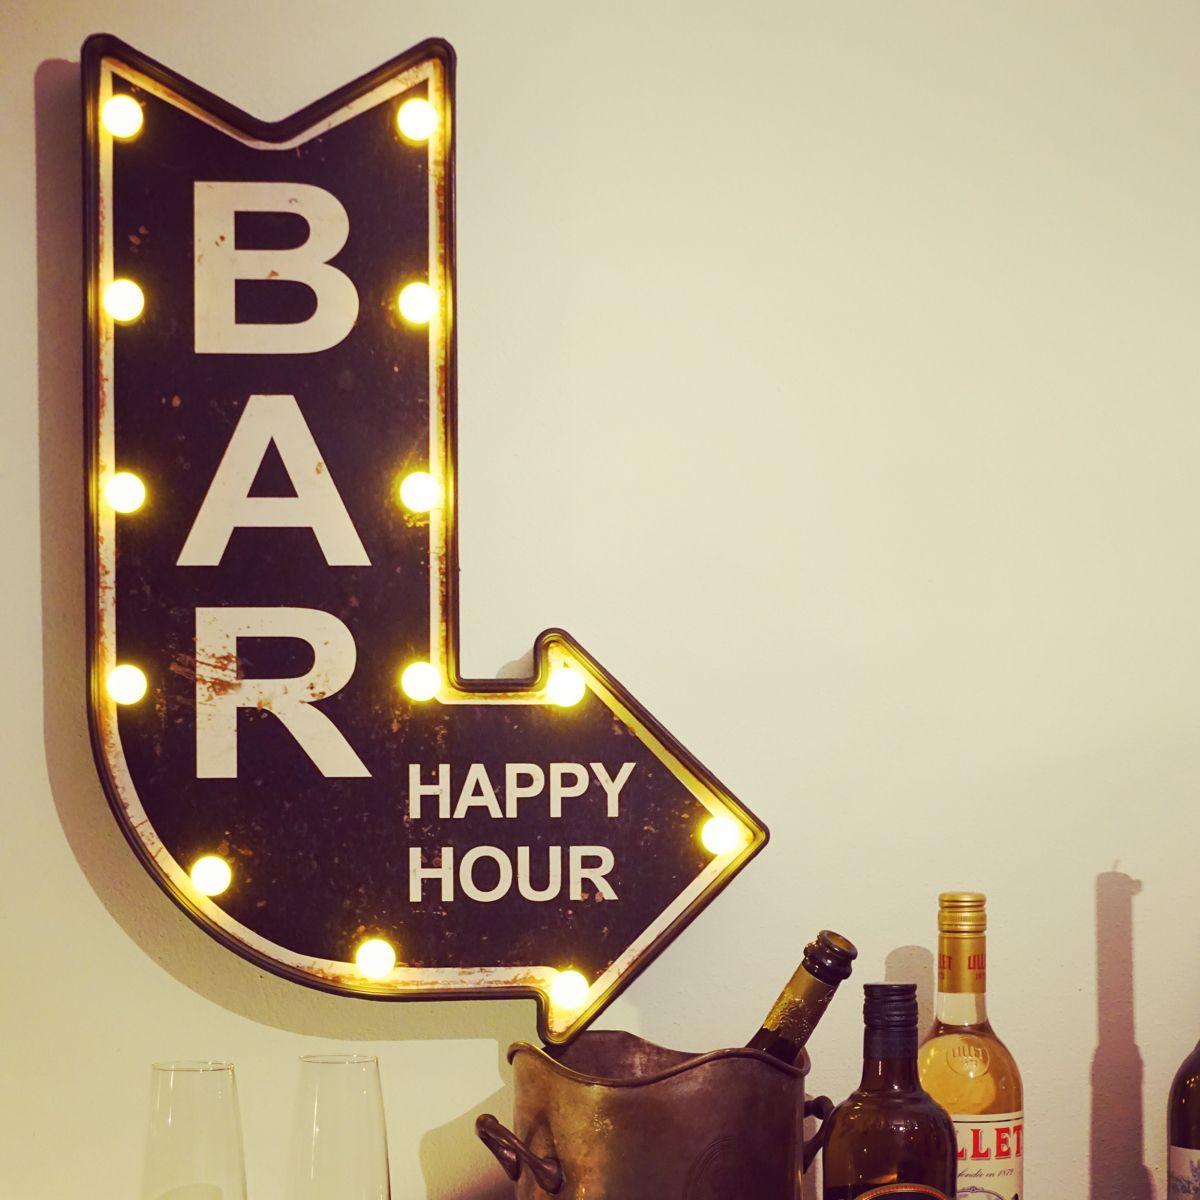 Bar Happy Hour Led Schild Mit Beleuchtung Led Schilder Led Partykeller